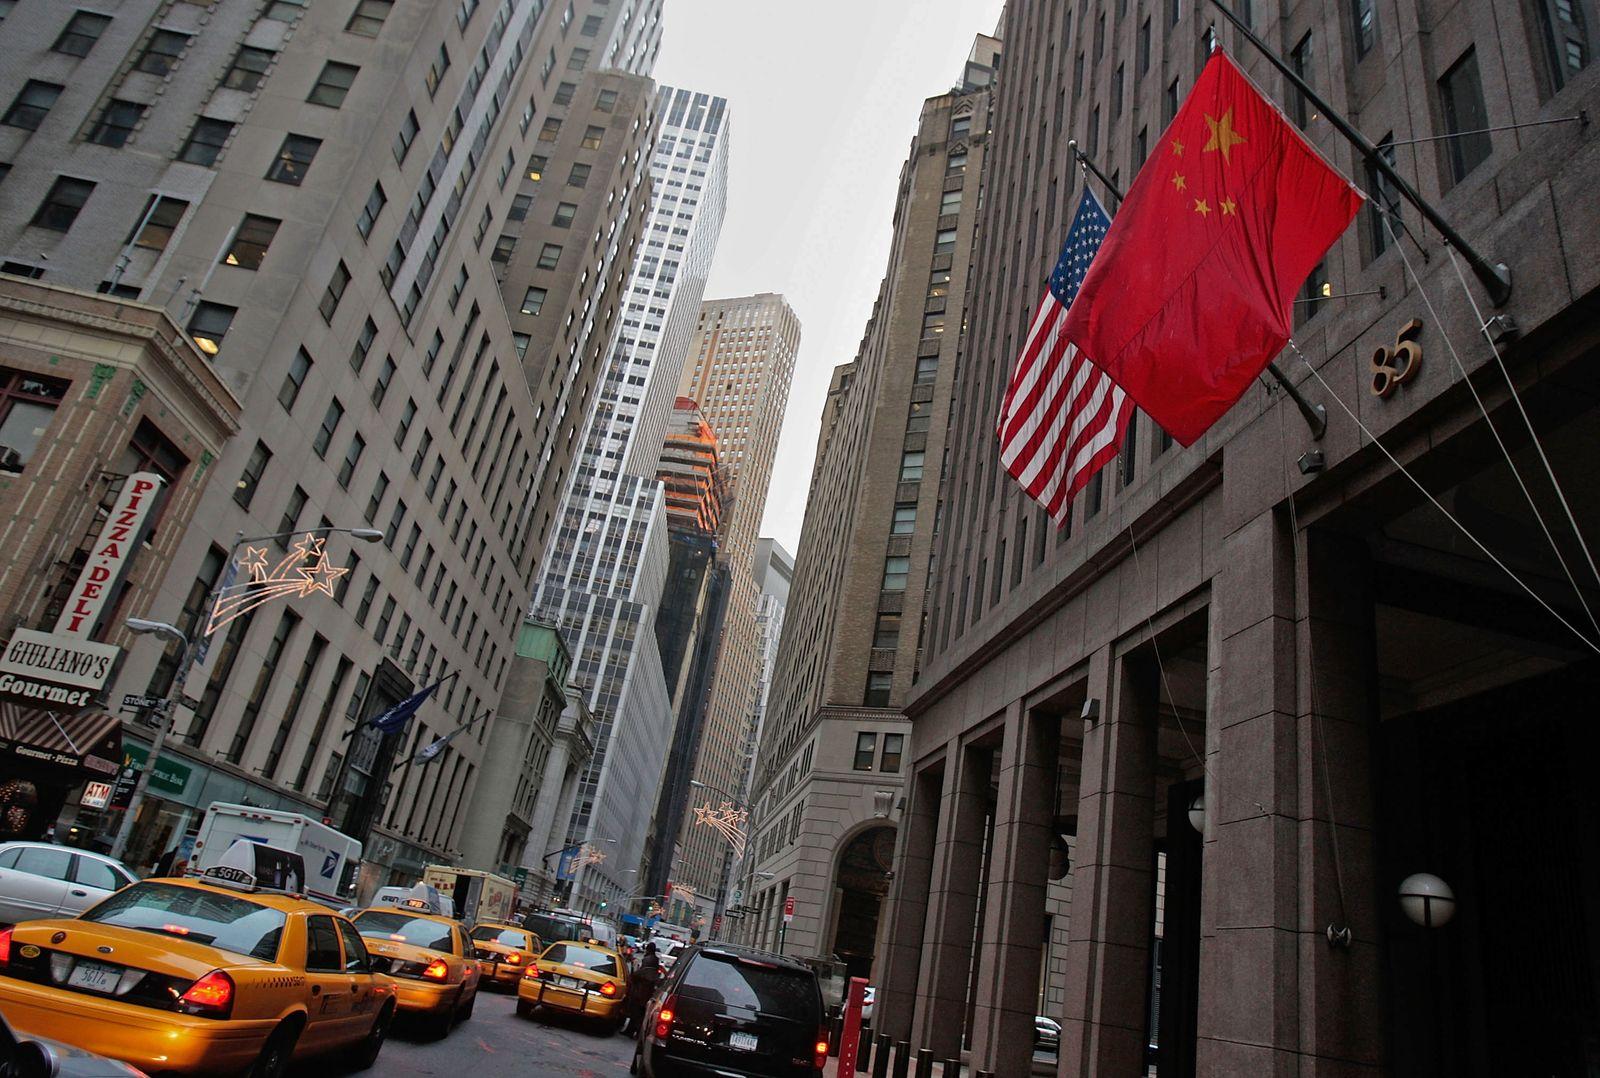 Goldman Sachs Post Quarterly Loss Of 2.1 Billion, First Loss Since Its IPO